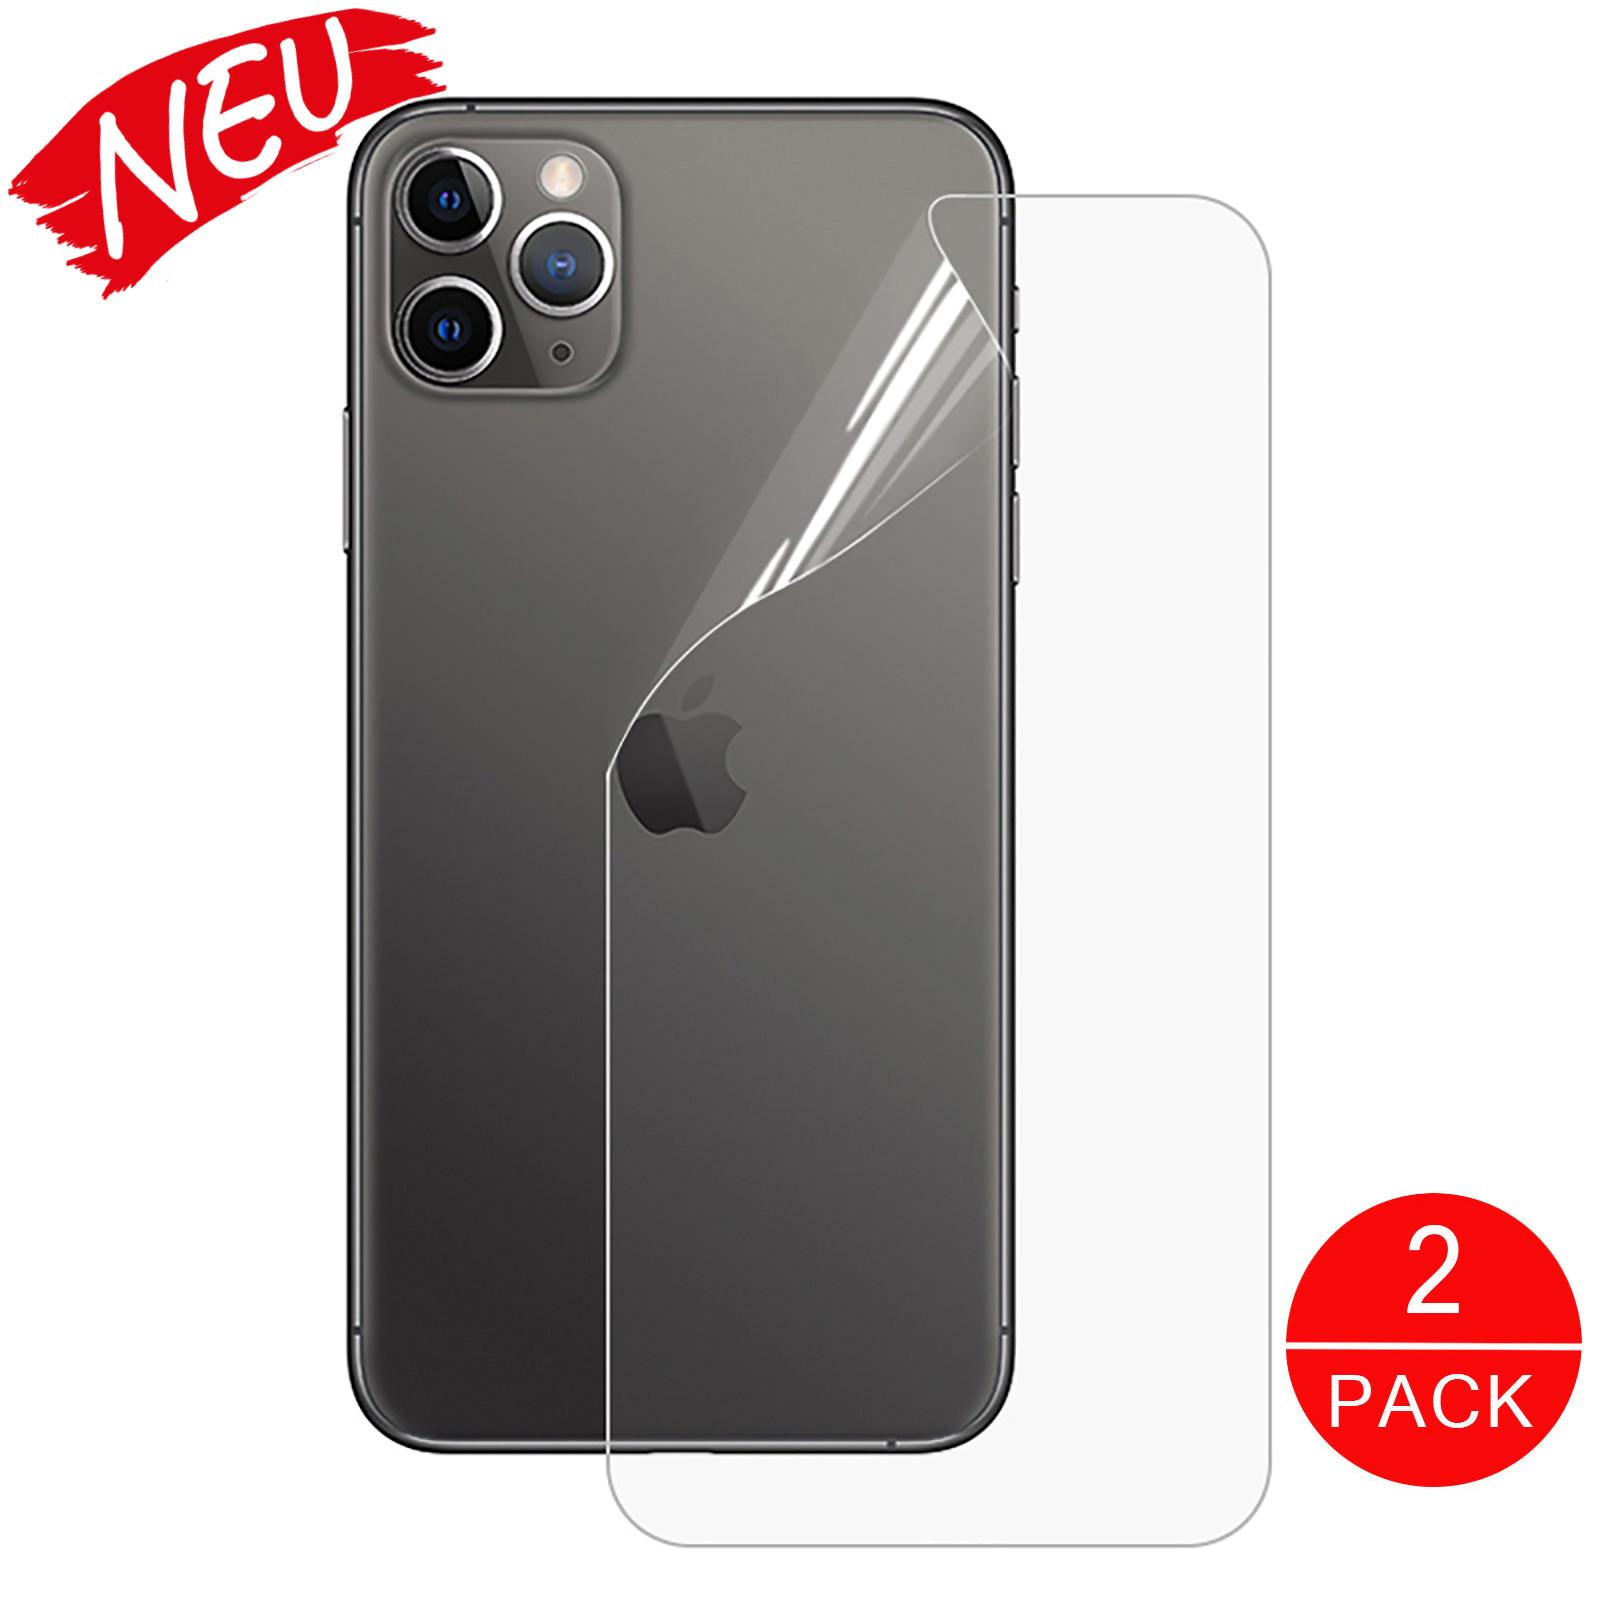 Hydrogel Schutzfolie Handy Rückseite Backcover iPhone11 Pro